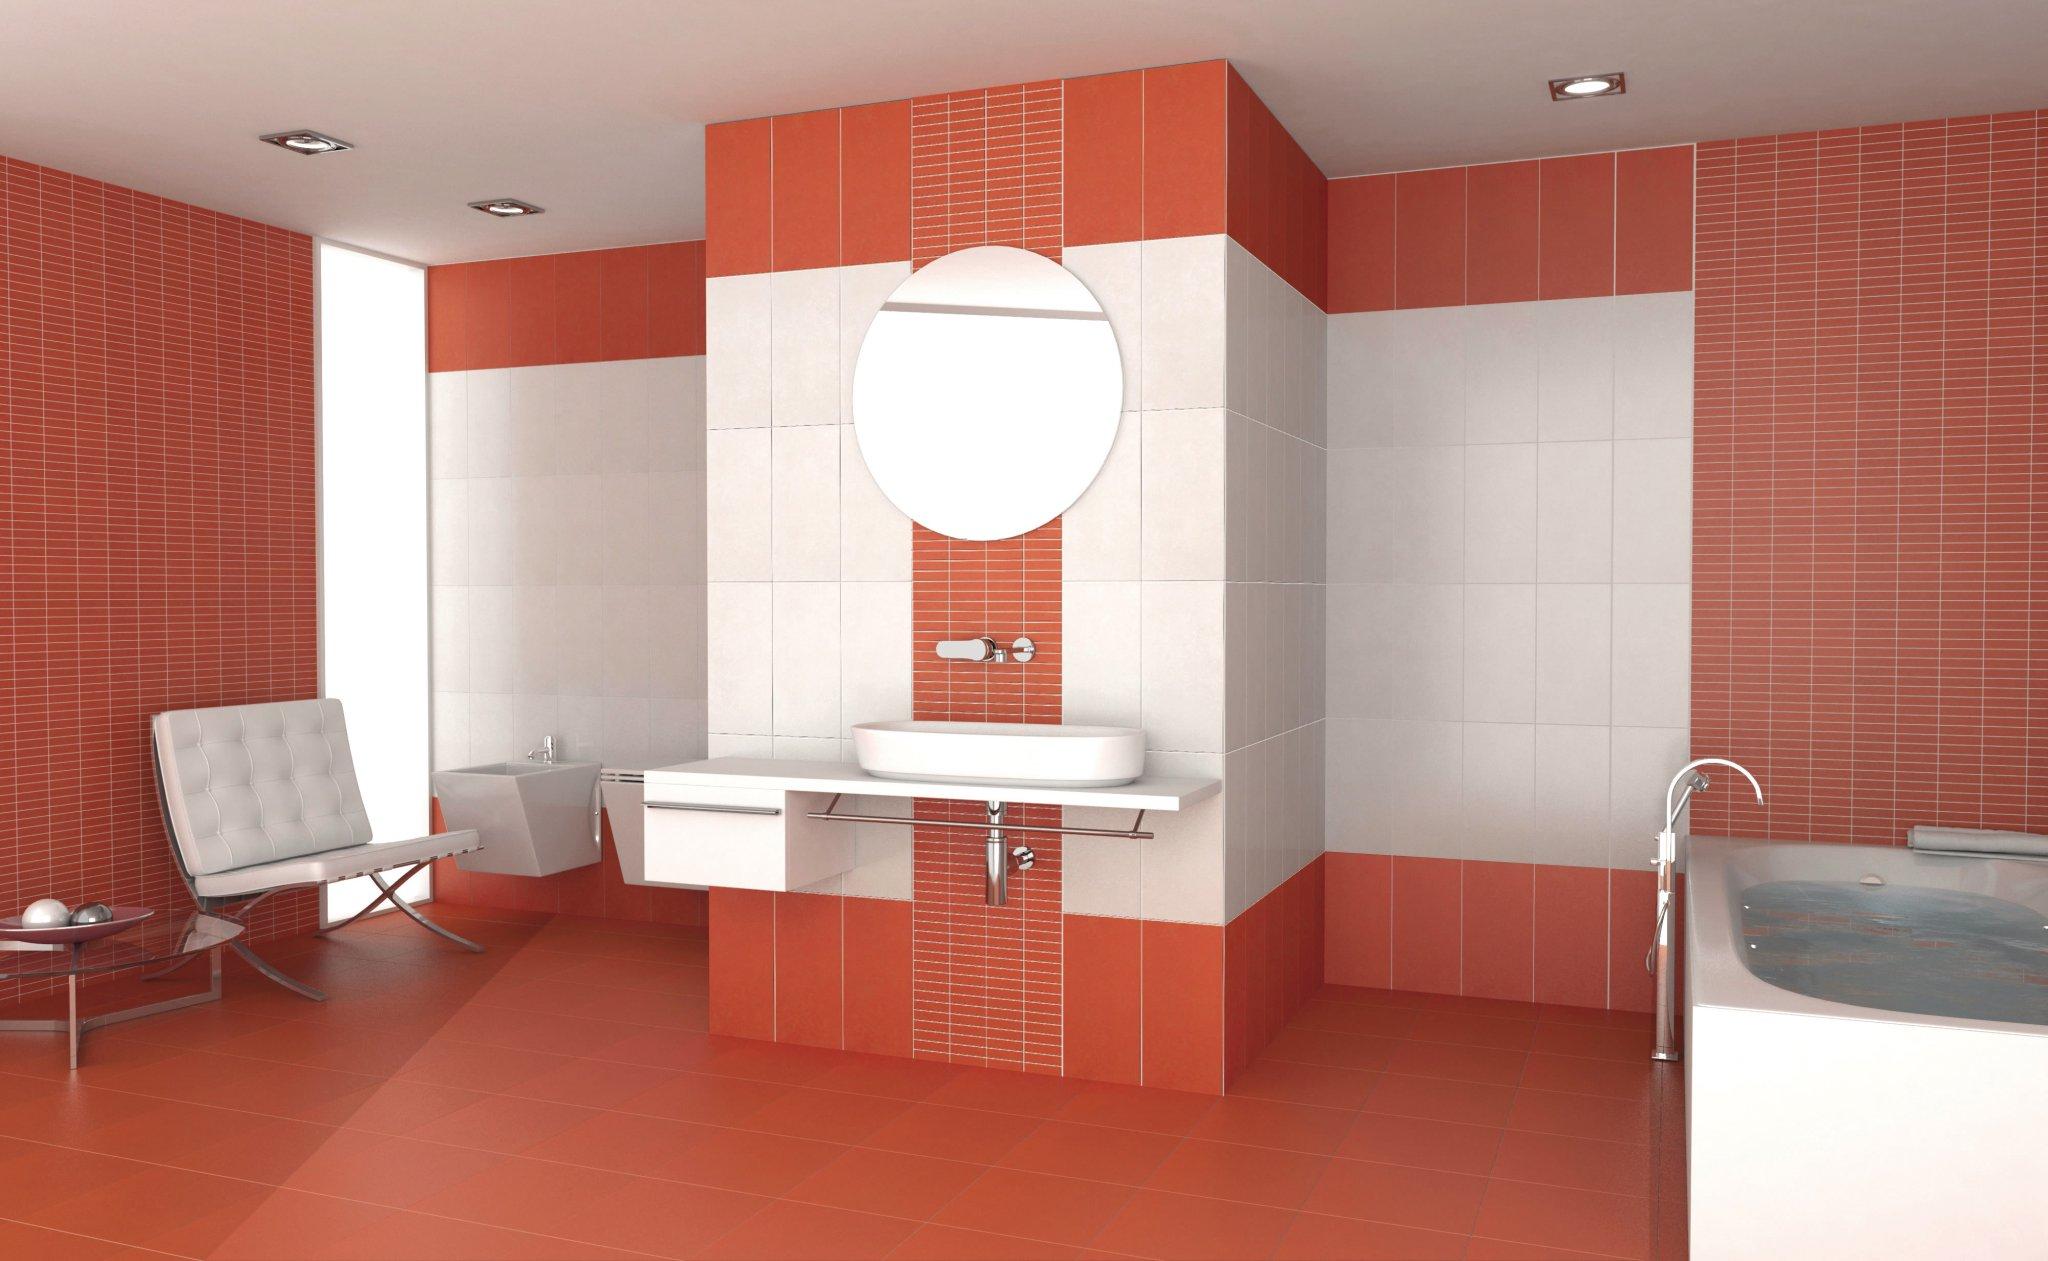 Feeling rivestimento bagno rosso moda ceramica - Rivestimento bagno moderno ...